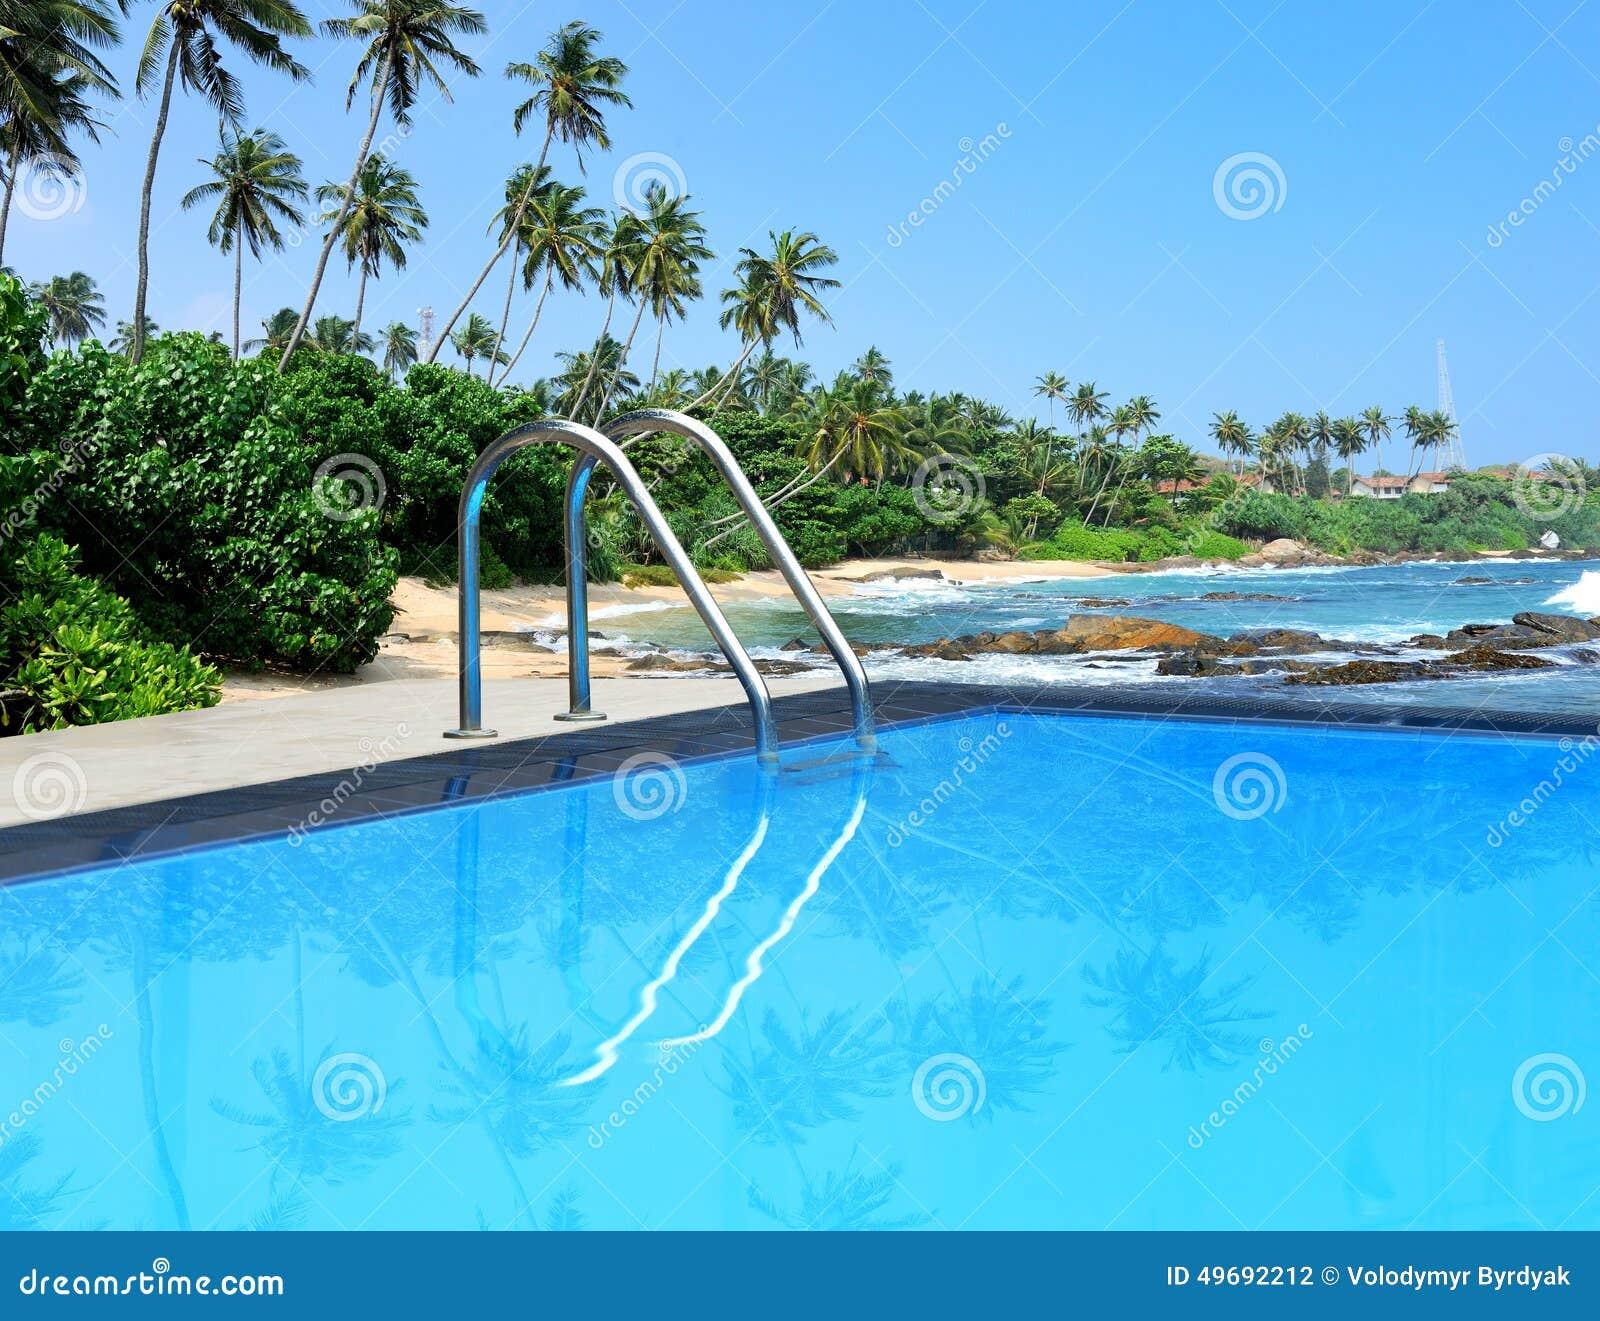 Swimming Pool Stock Photo Image Of Outdoor Beach Ocean 49692212